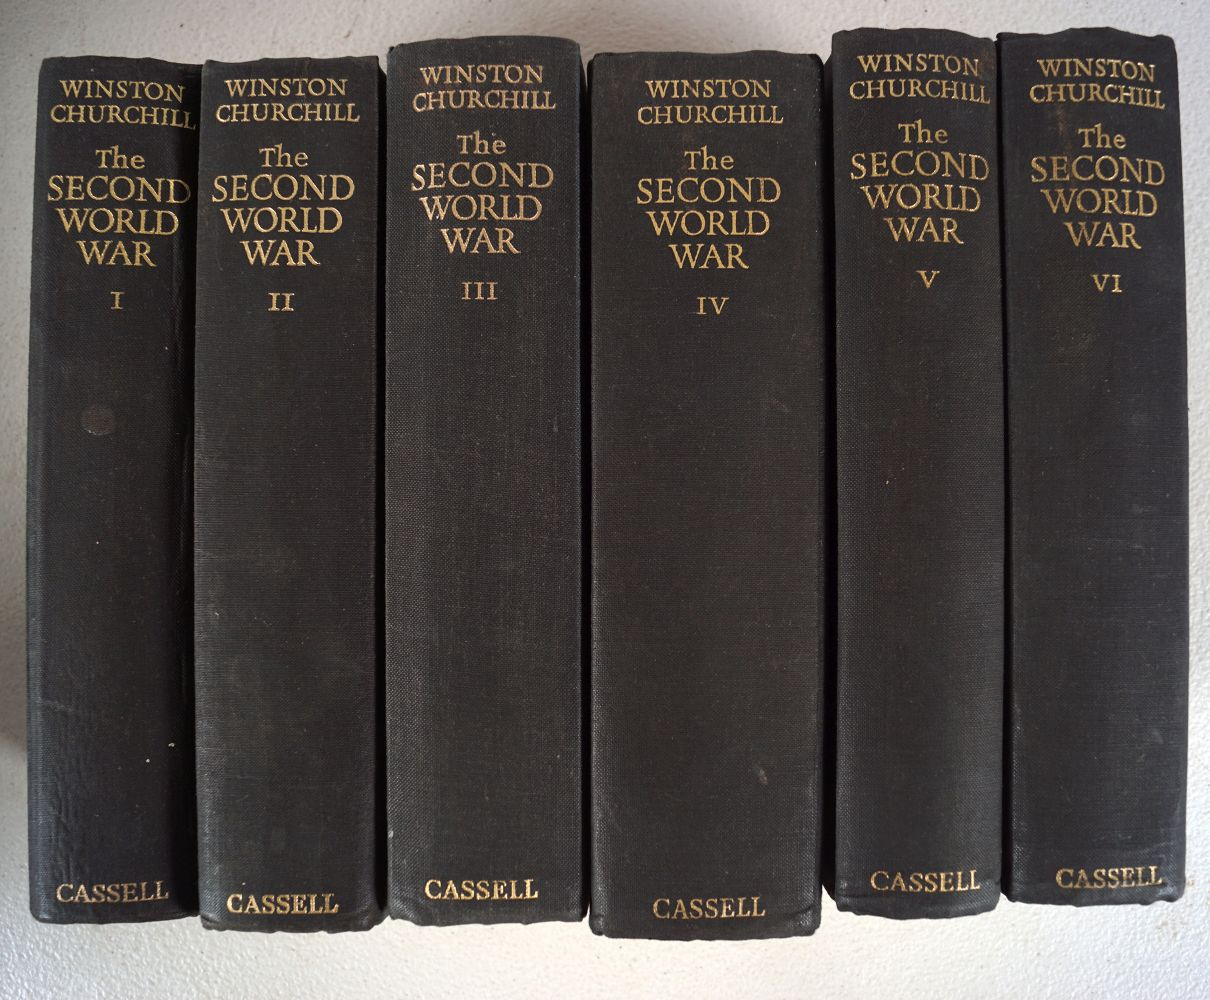 WINSTON CHURCHILL THE SECOND WORLD WAR 6 VOLUMES